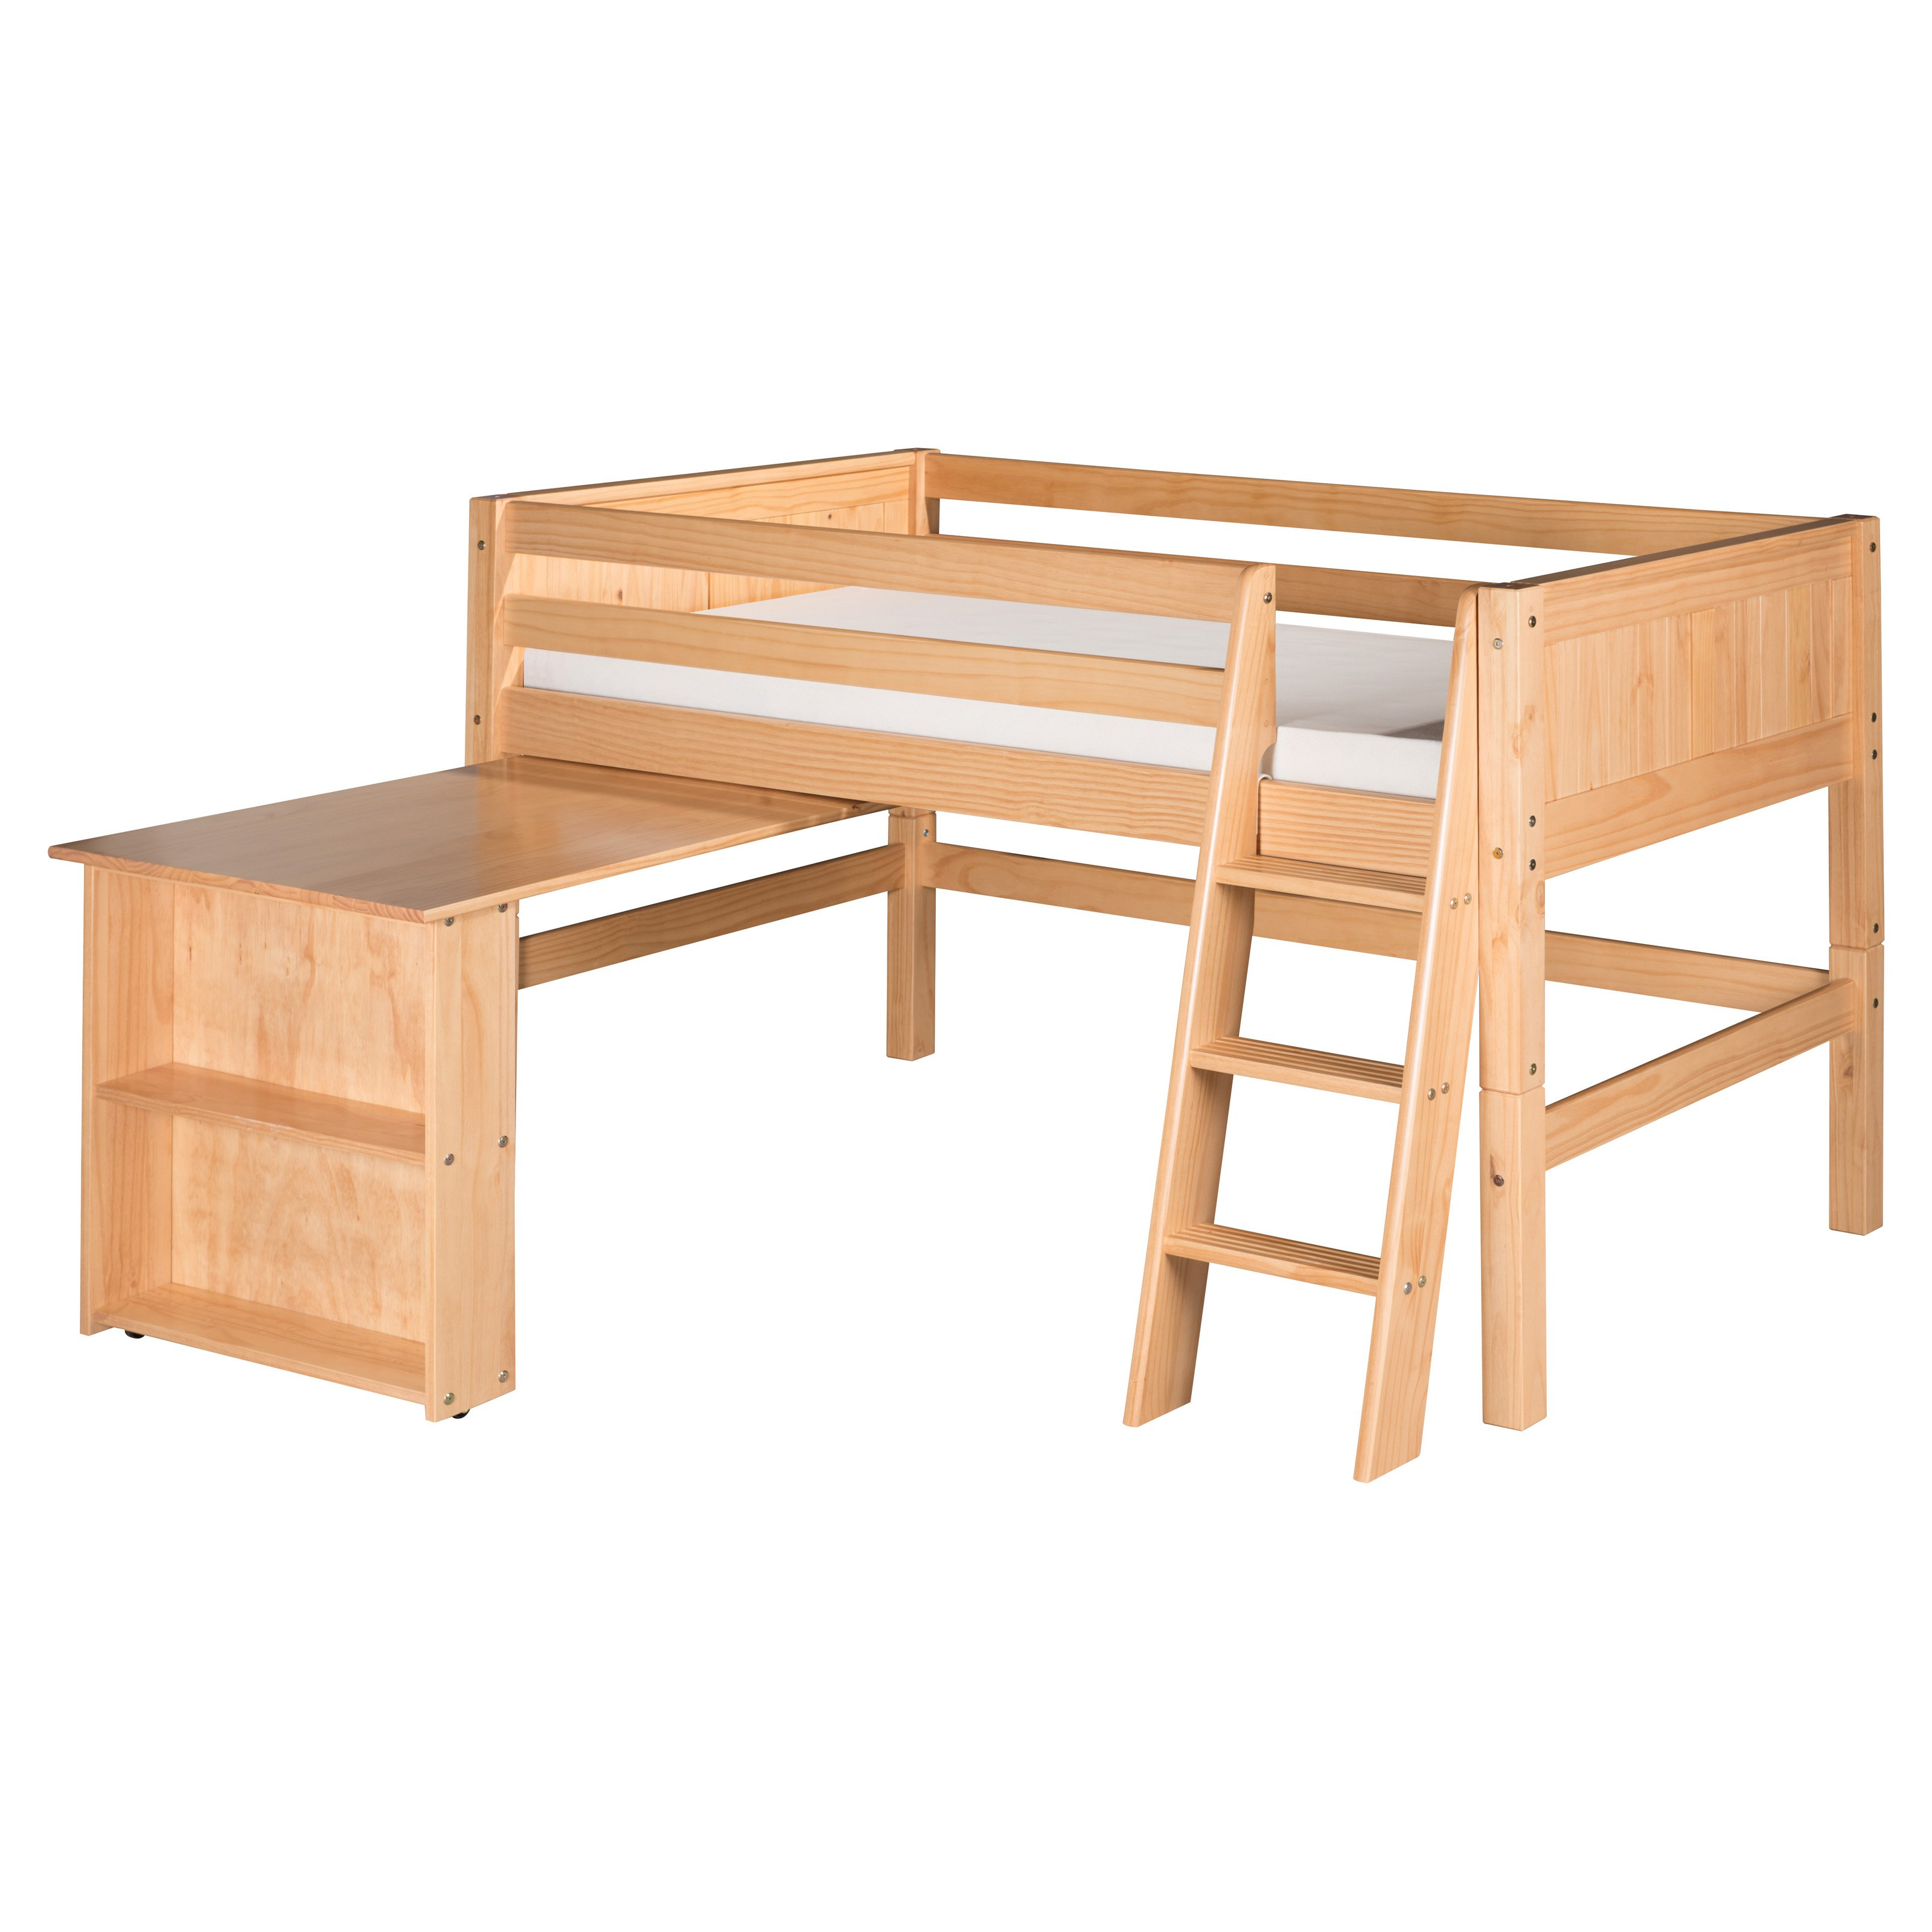 camaflexi panel headboard low loft bed with retractable desk  - camaflexi panel headboard low loft bed with retractable desk  walmartcom